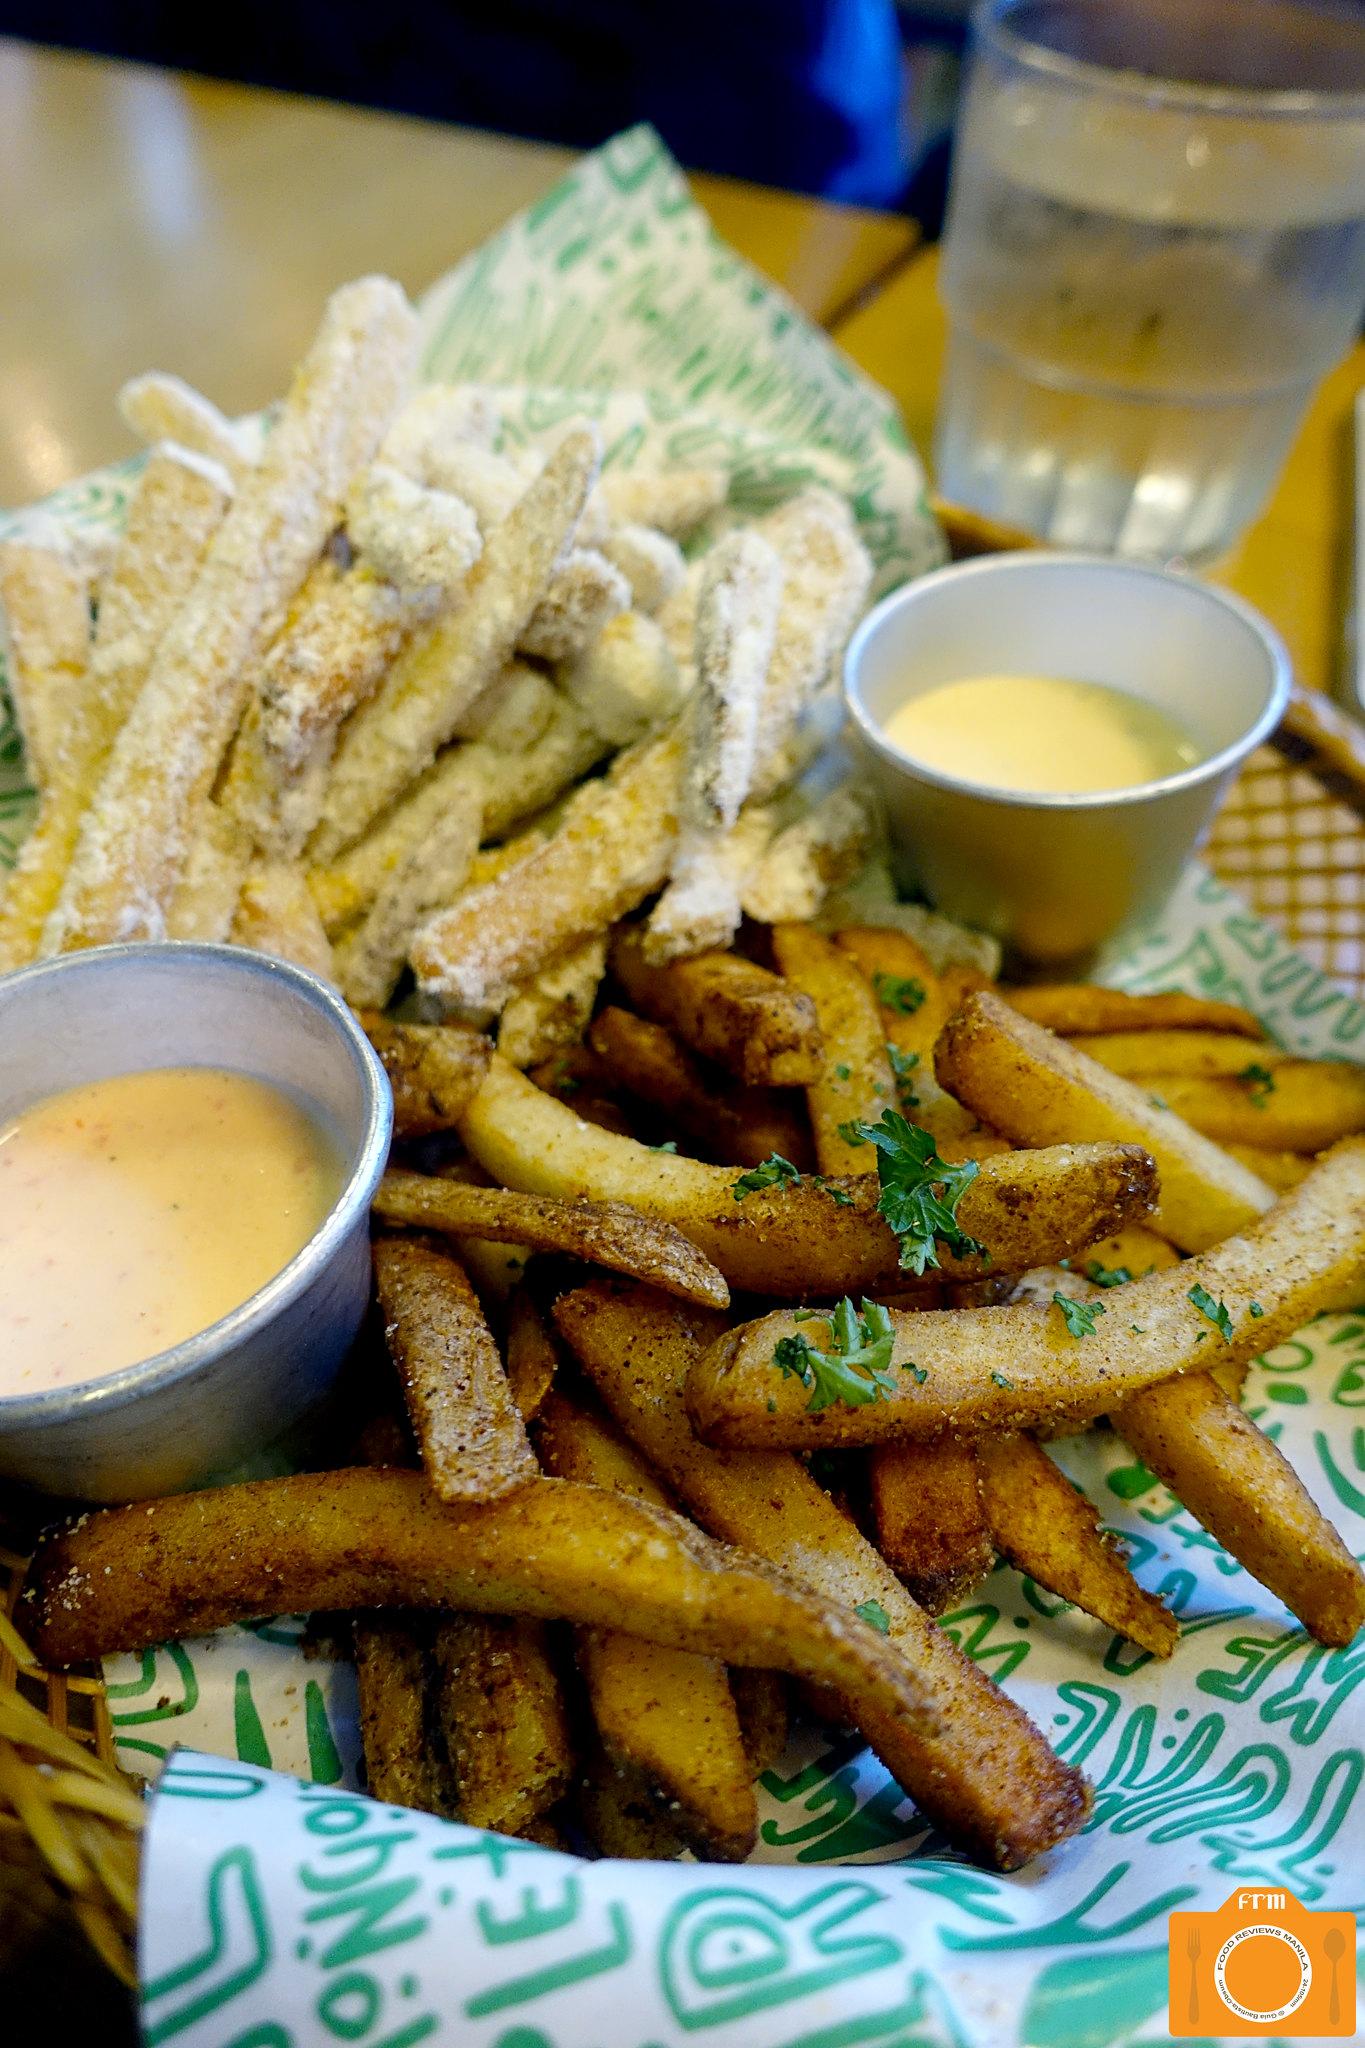 Let's Eat fries